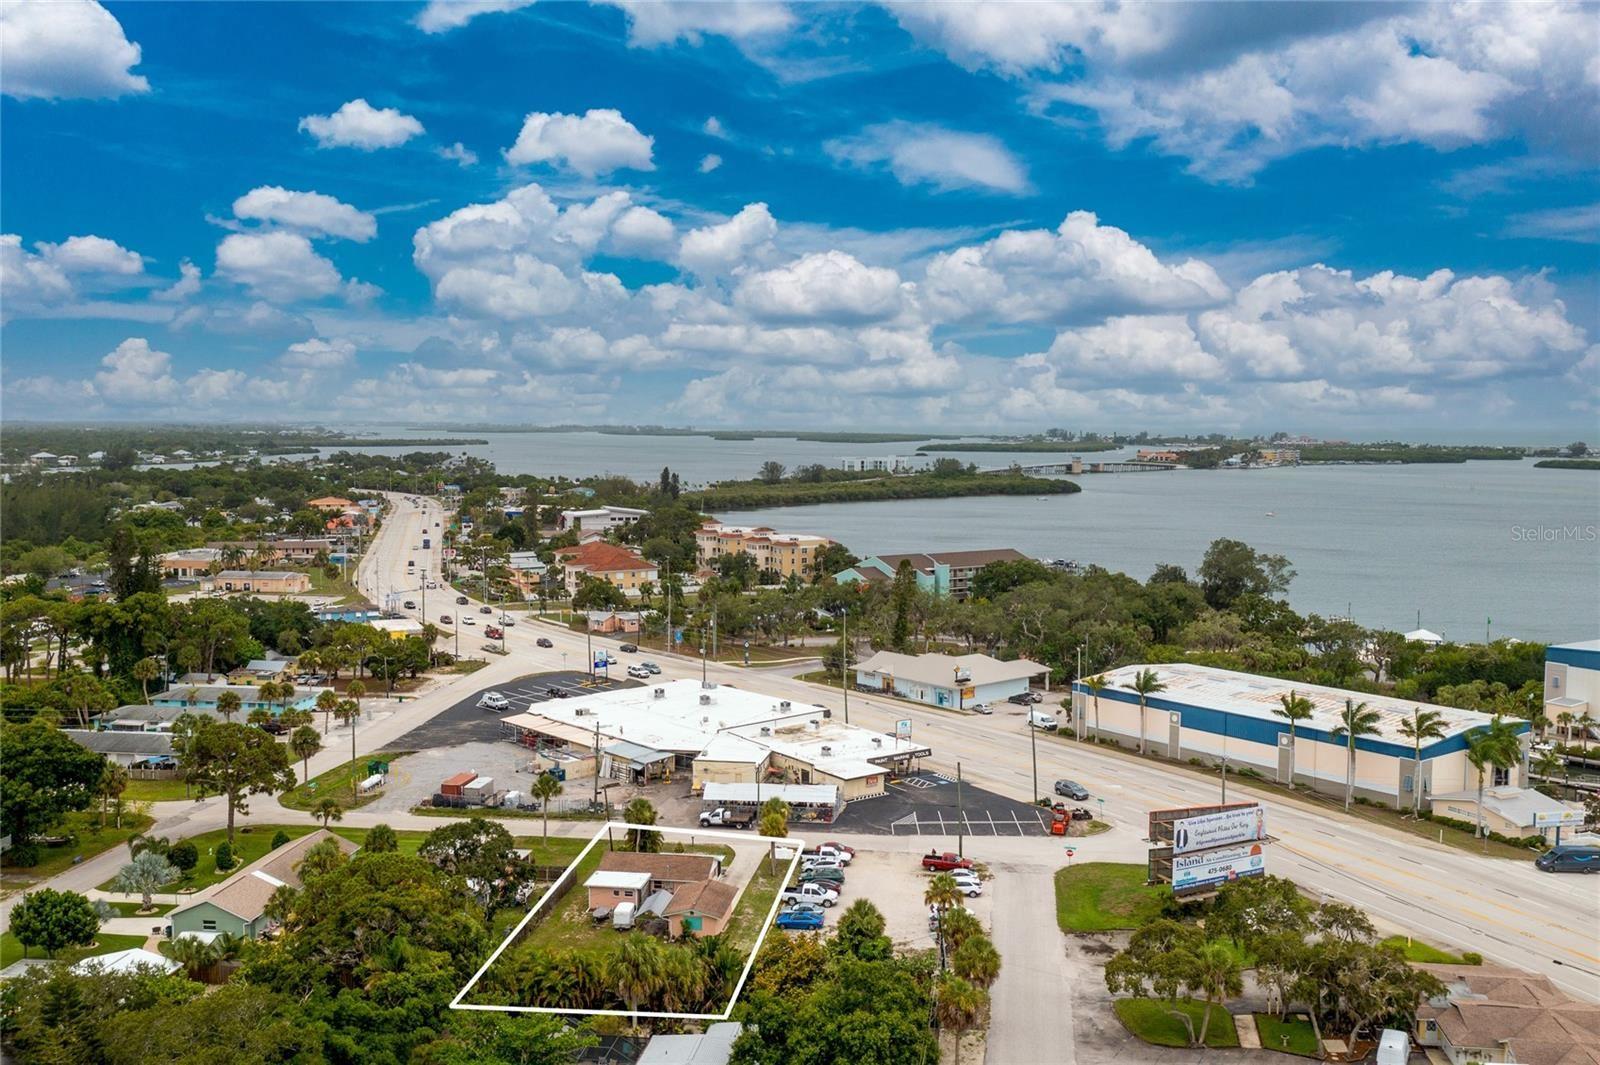 Photo of 56 E RIVERVIEW AVENUE, ENGLEWOOD, FL 34223 (MLS # D6119659)